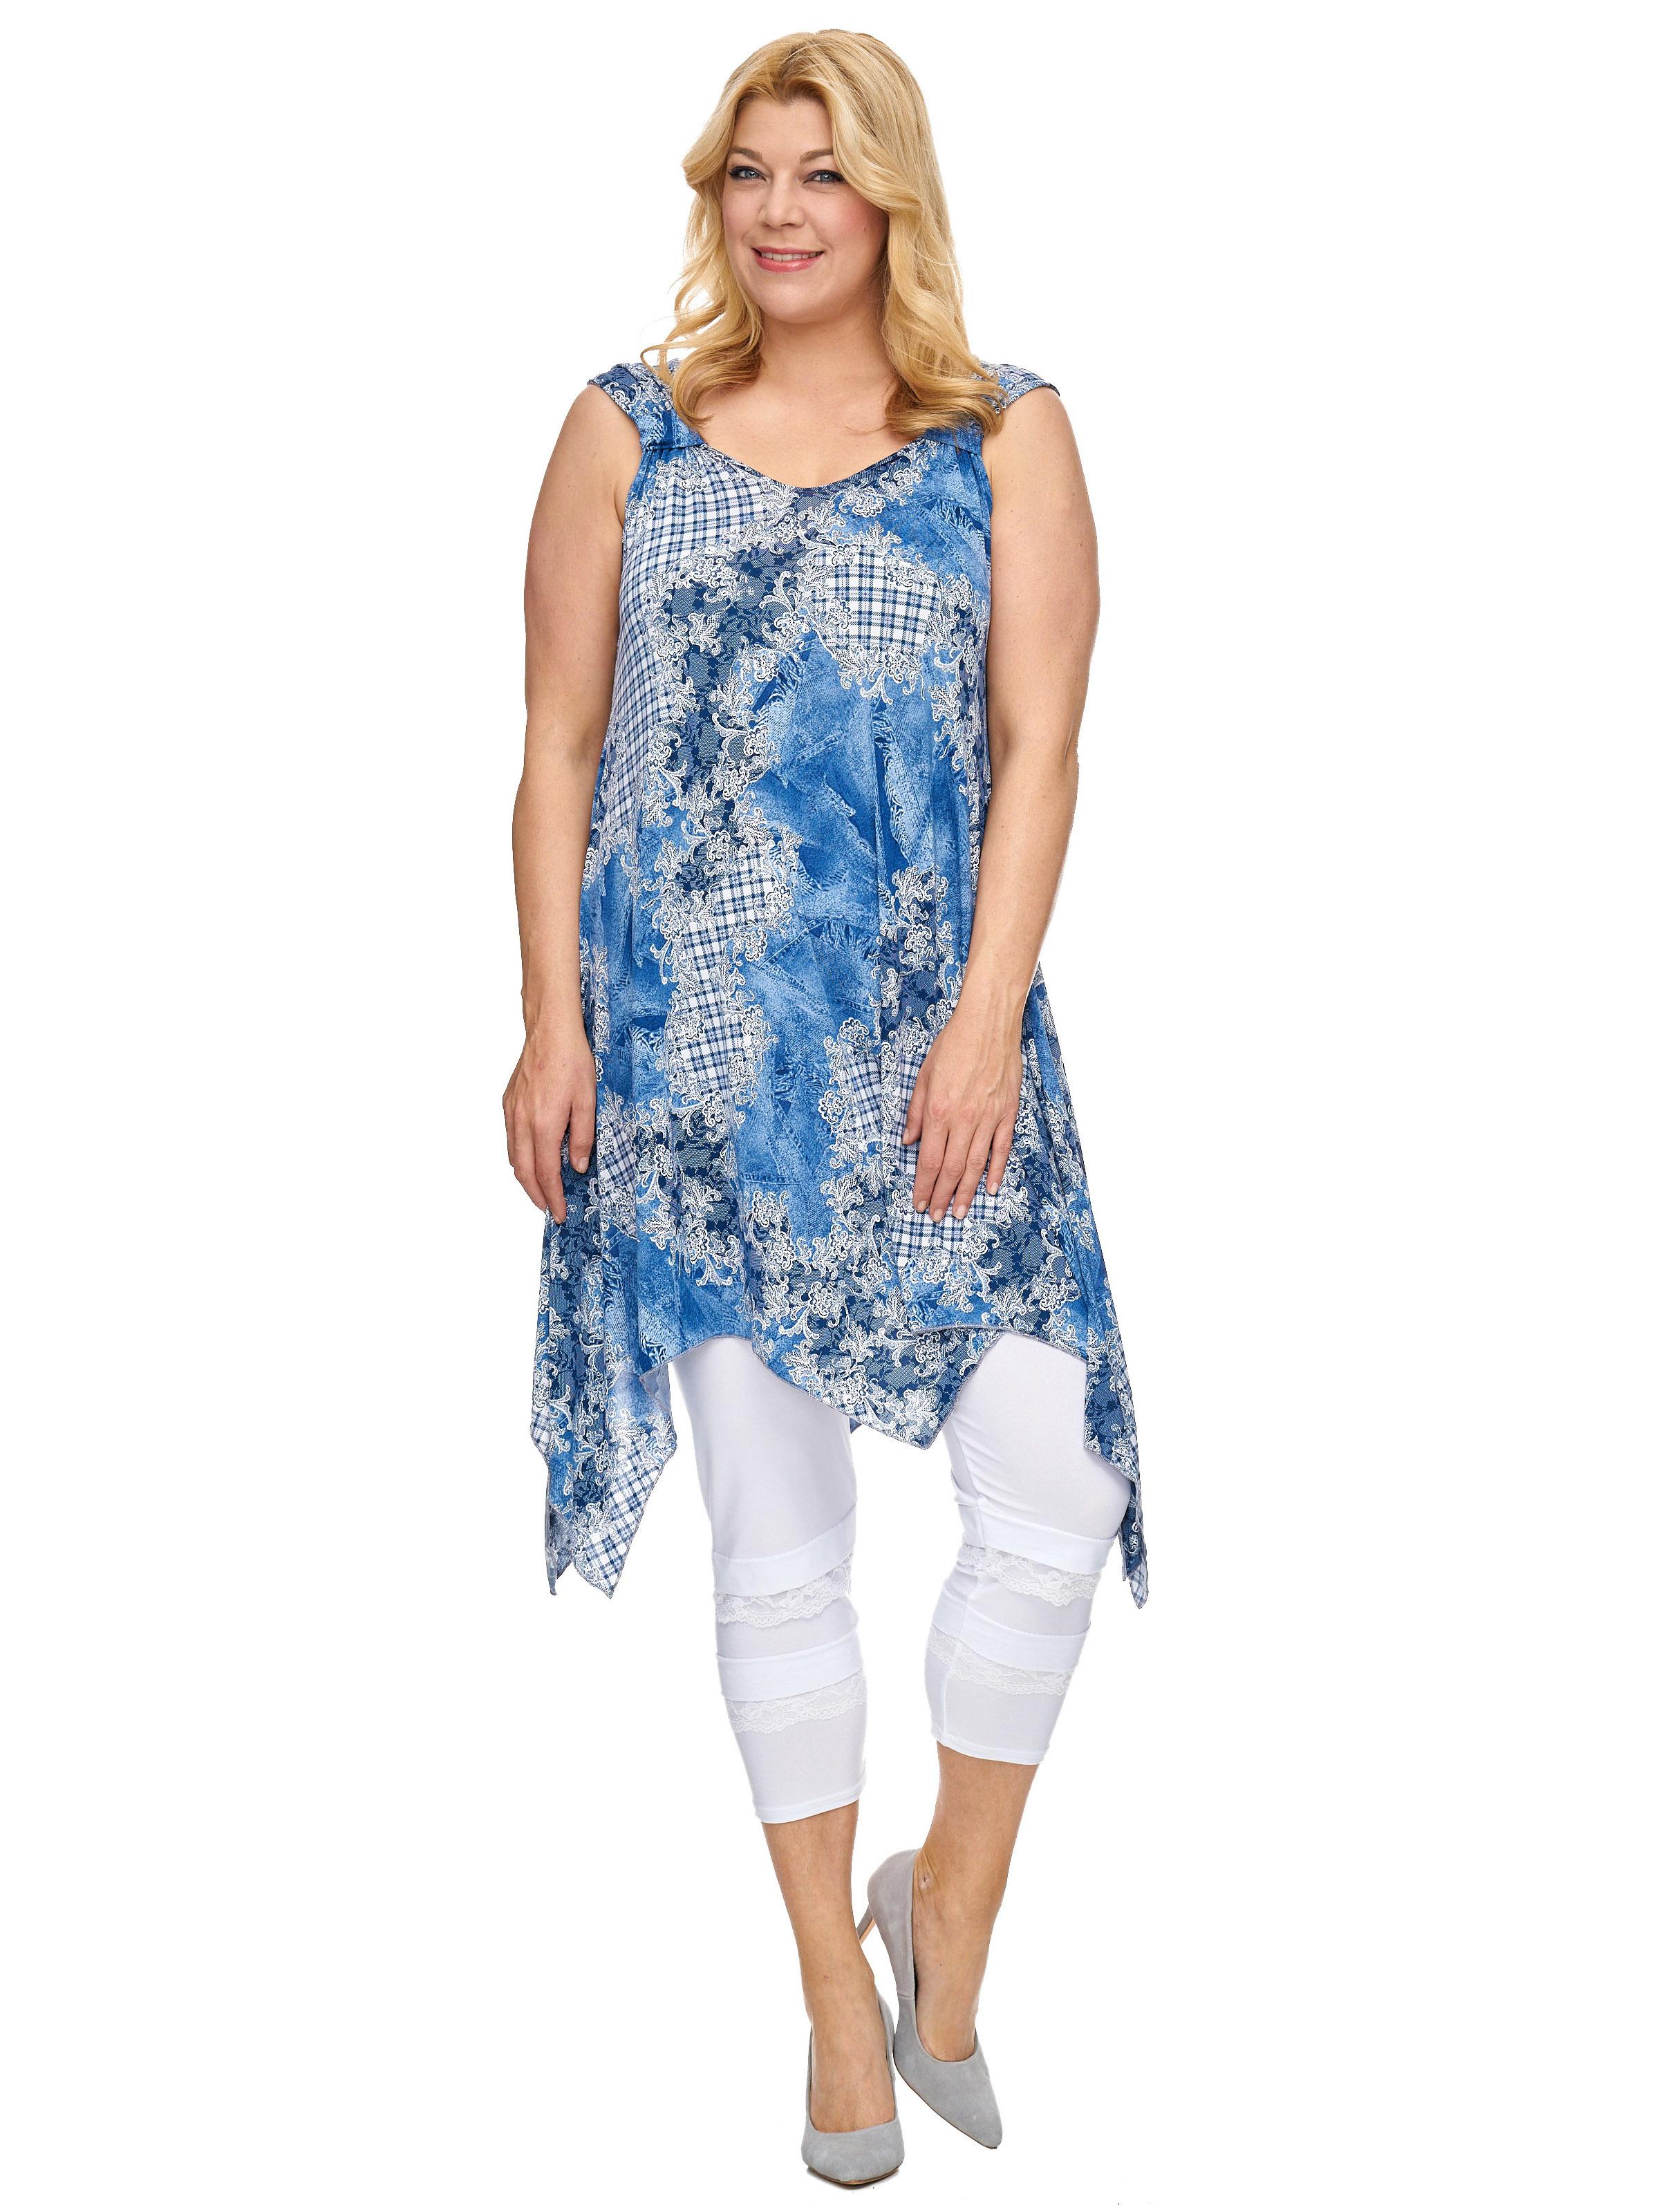 cf7a2d98ed45 Details zu Damen Tunika Sommerkleid Kleid Partykleid blau Cocktailkleid  Lang Strandkleid